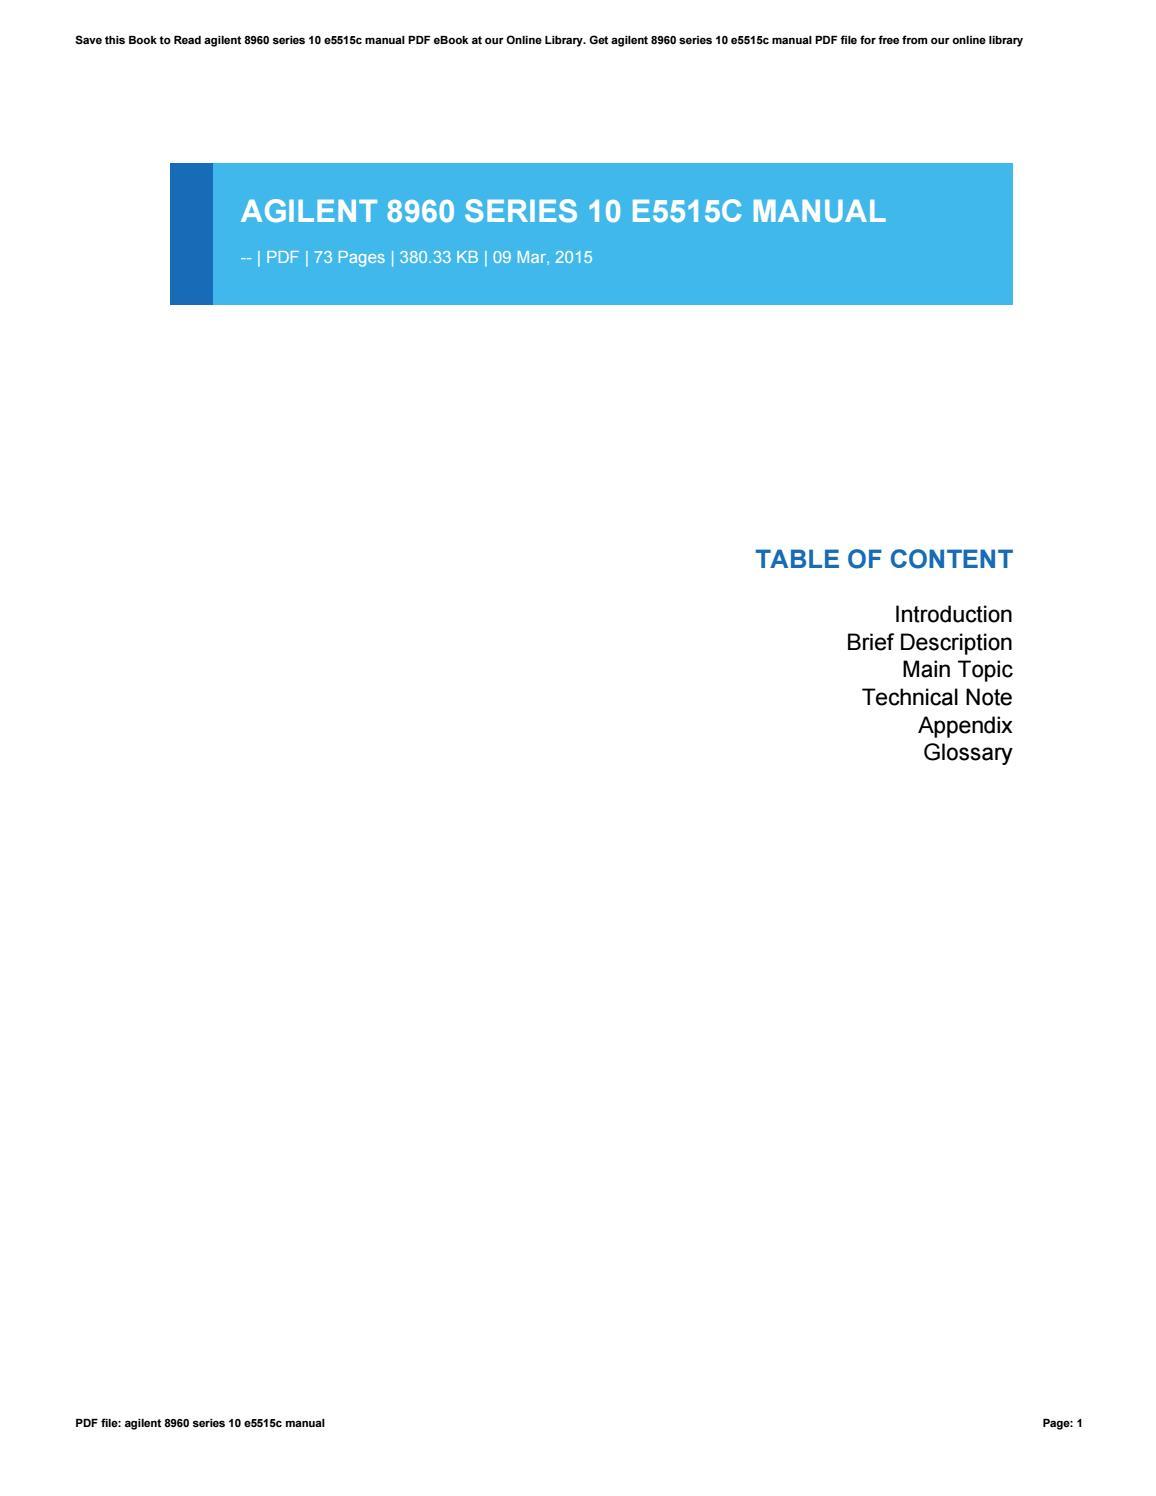 canon canonet ql19 manual ebook on